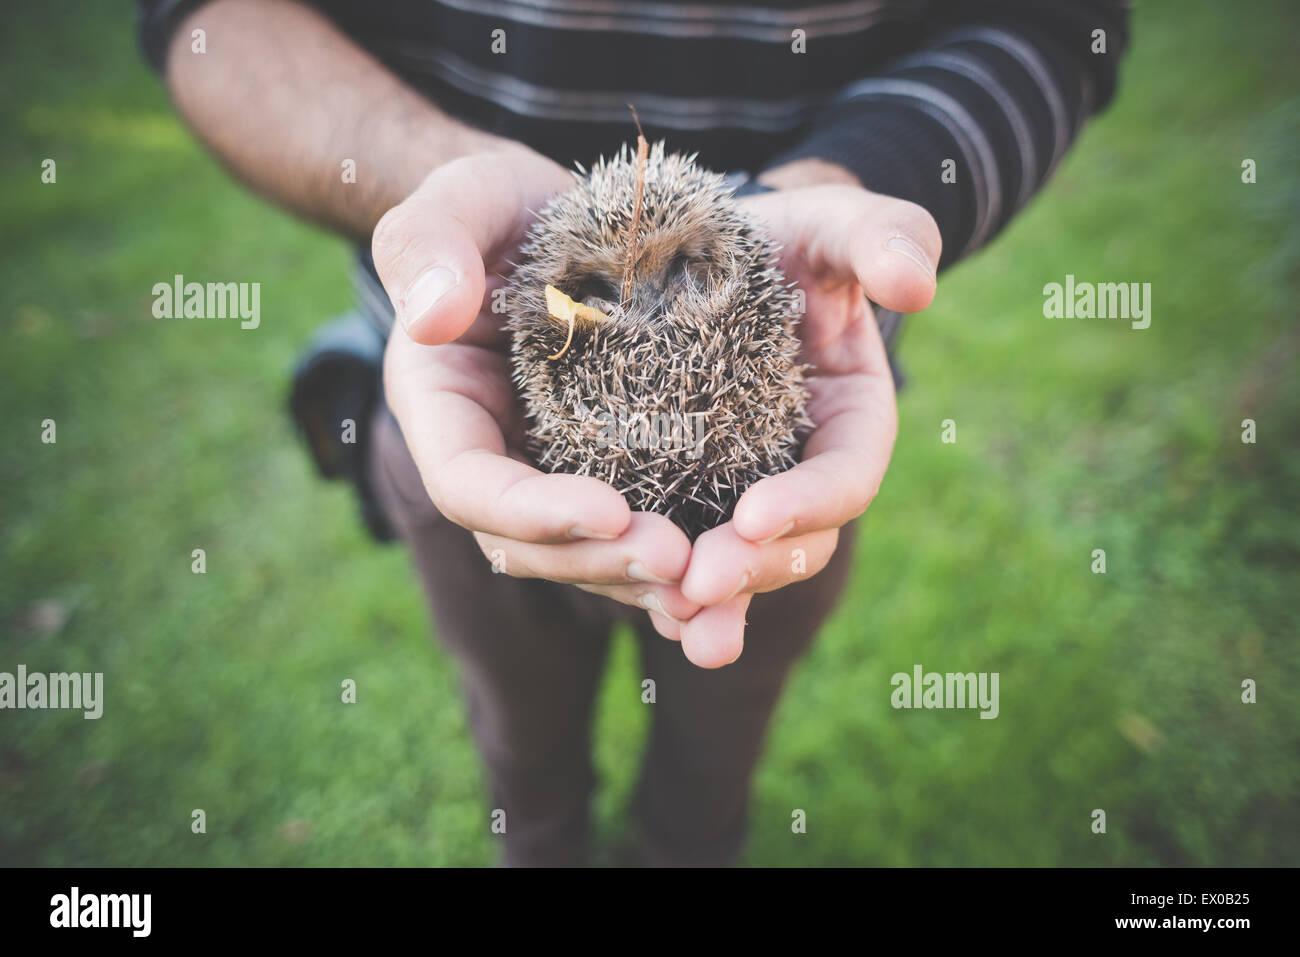 Man holding hedgehog - Stock Image